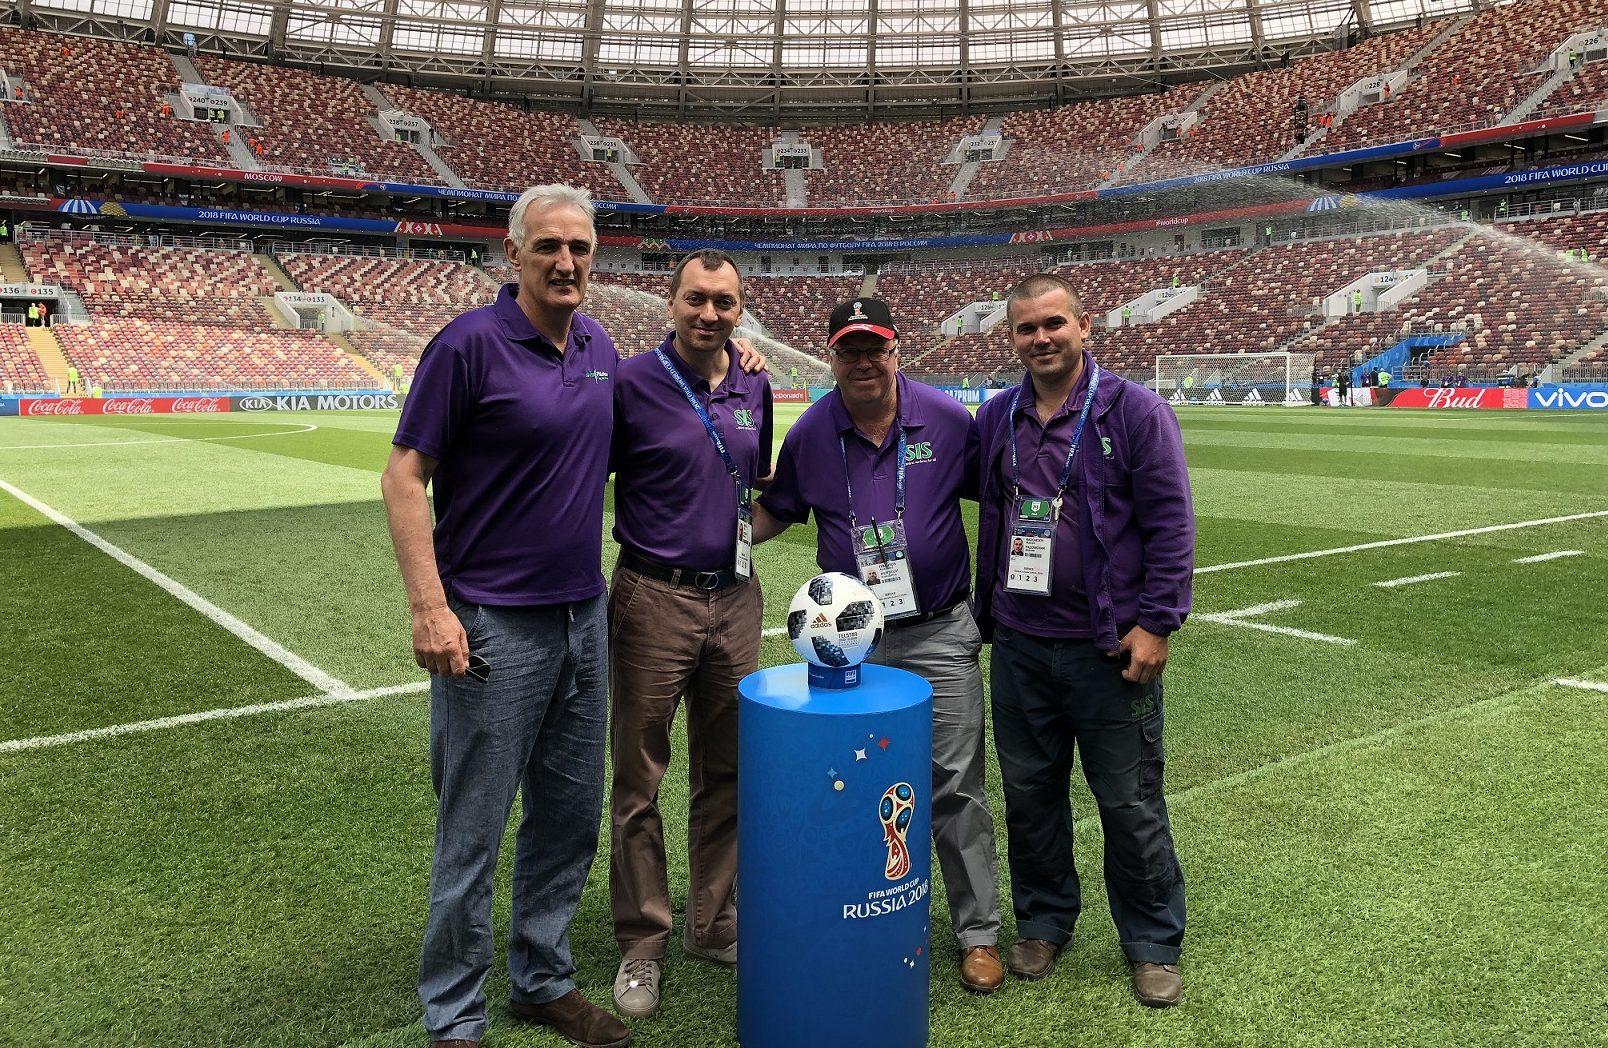 SIS Pitches Team SISGrass World Cup Stadium